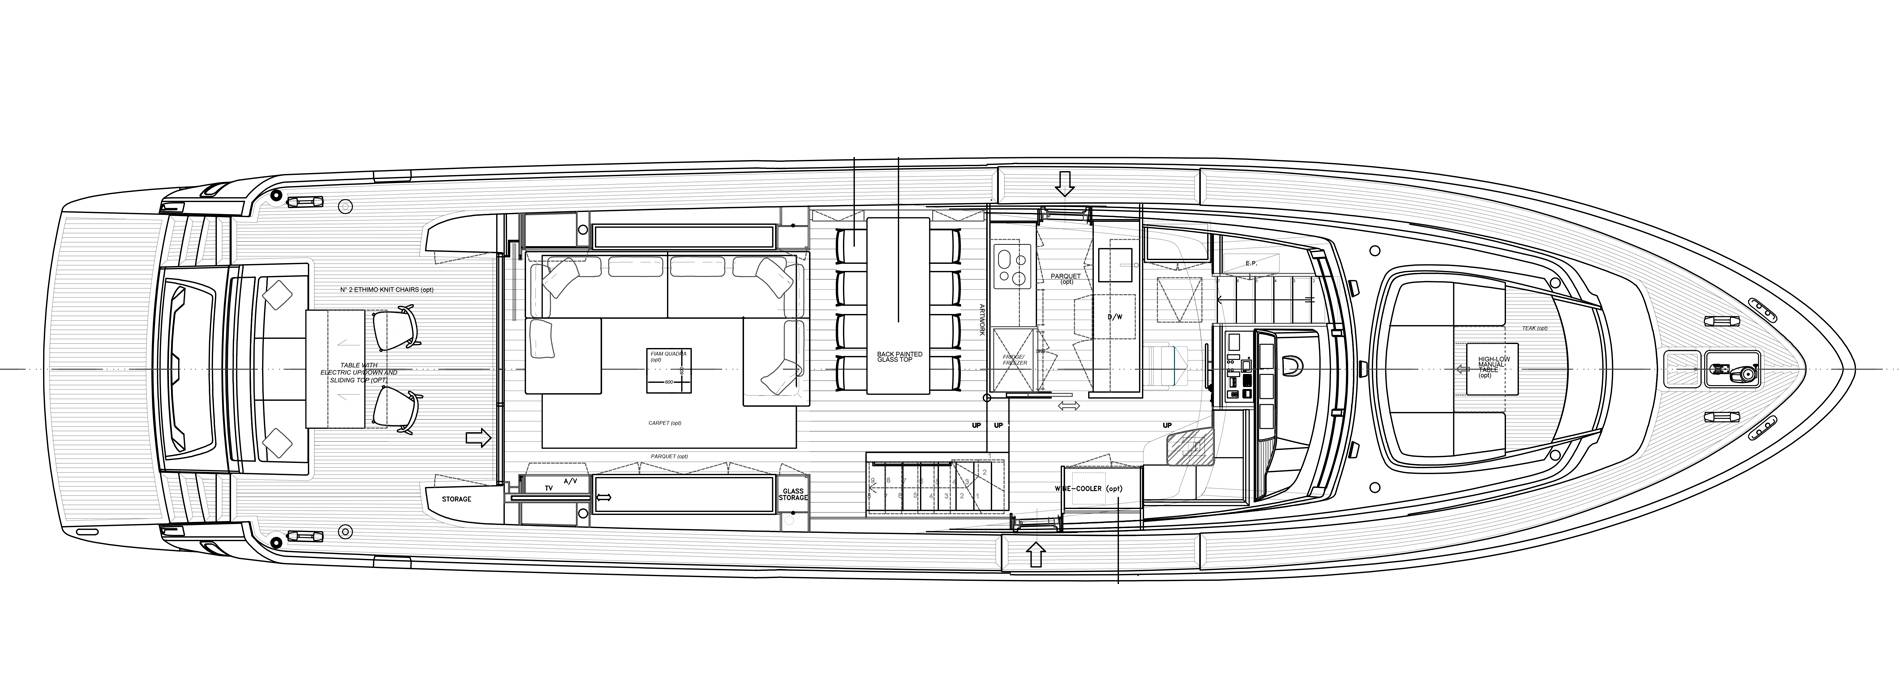 Sanlorenzo Yachts SL78-695 Main deck